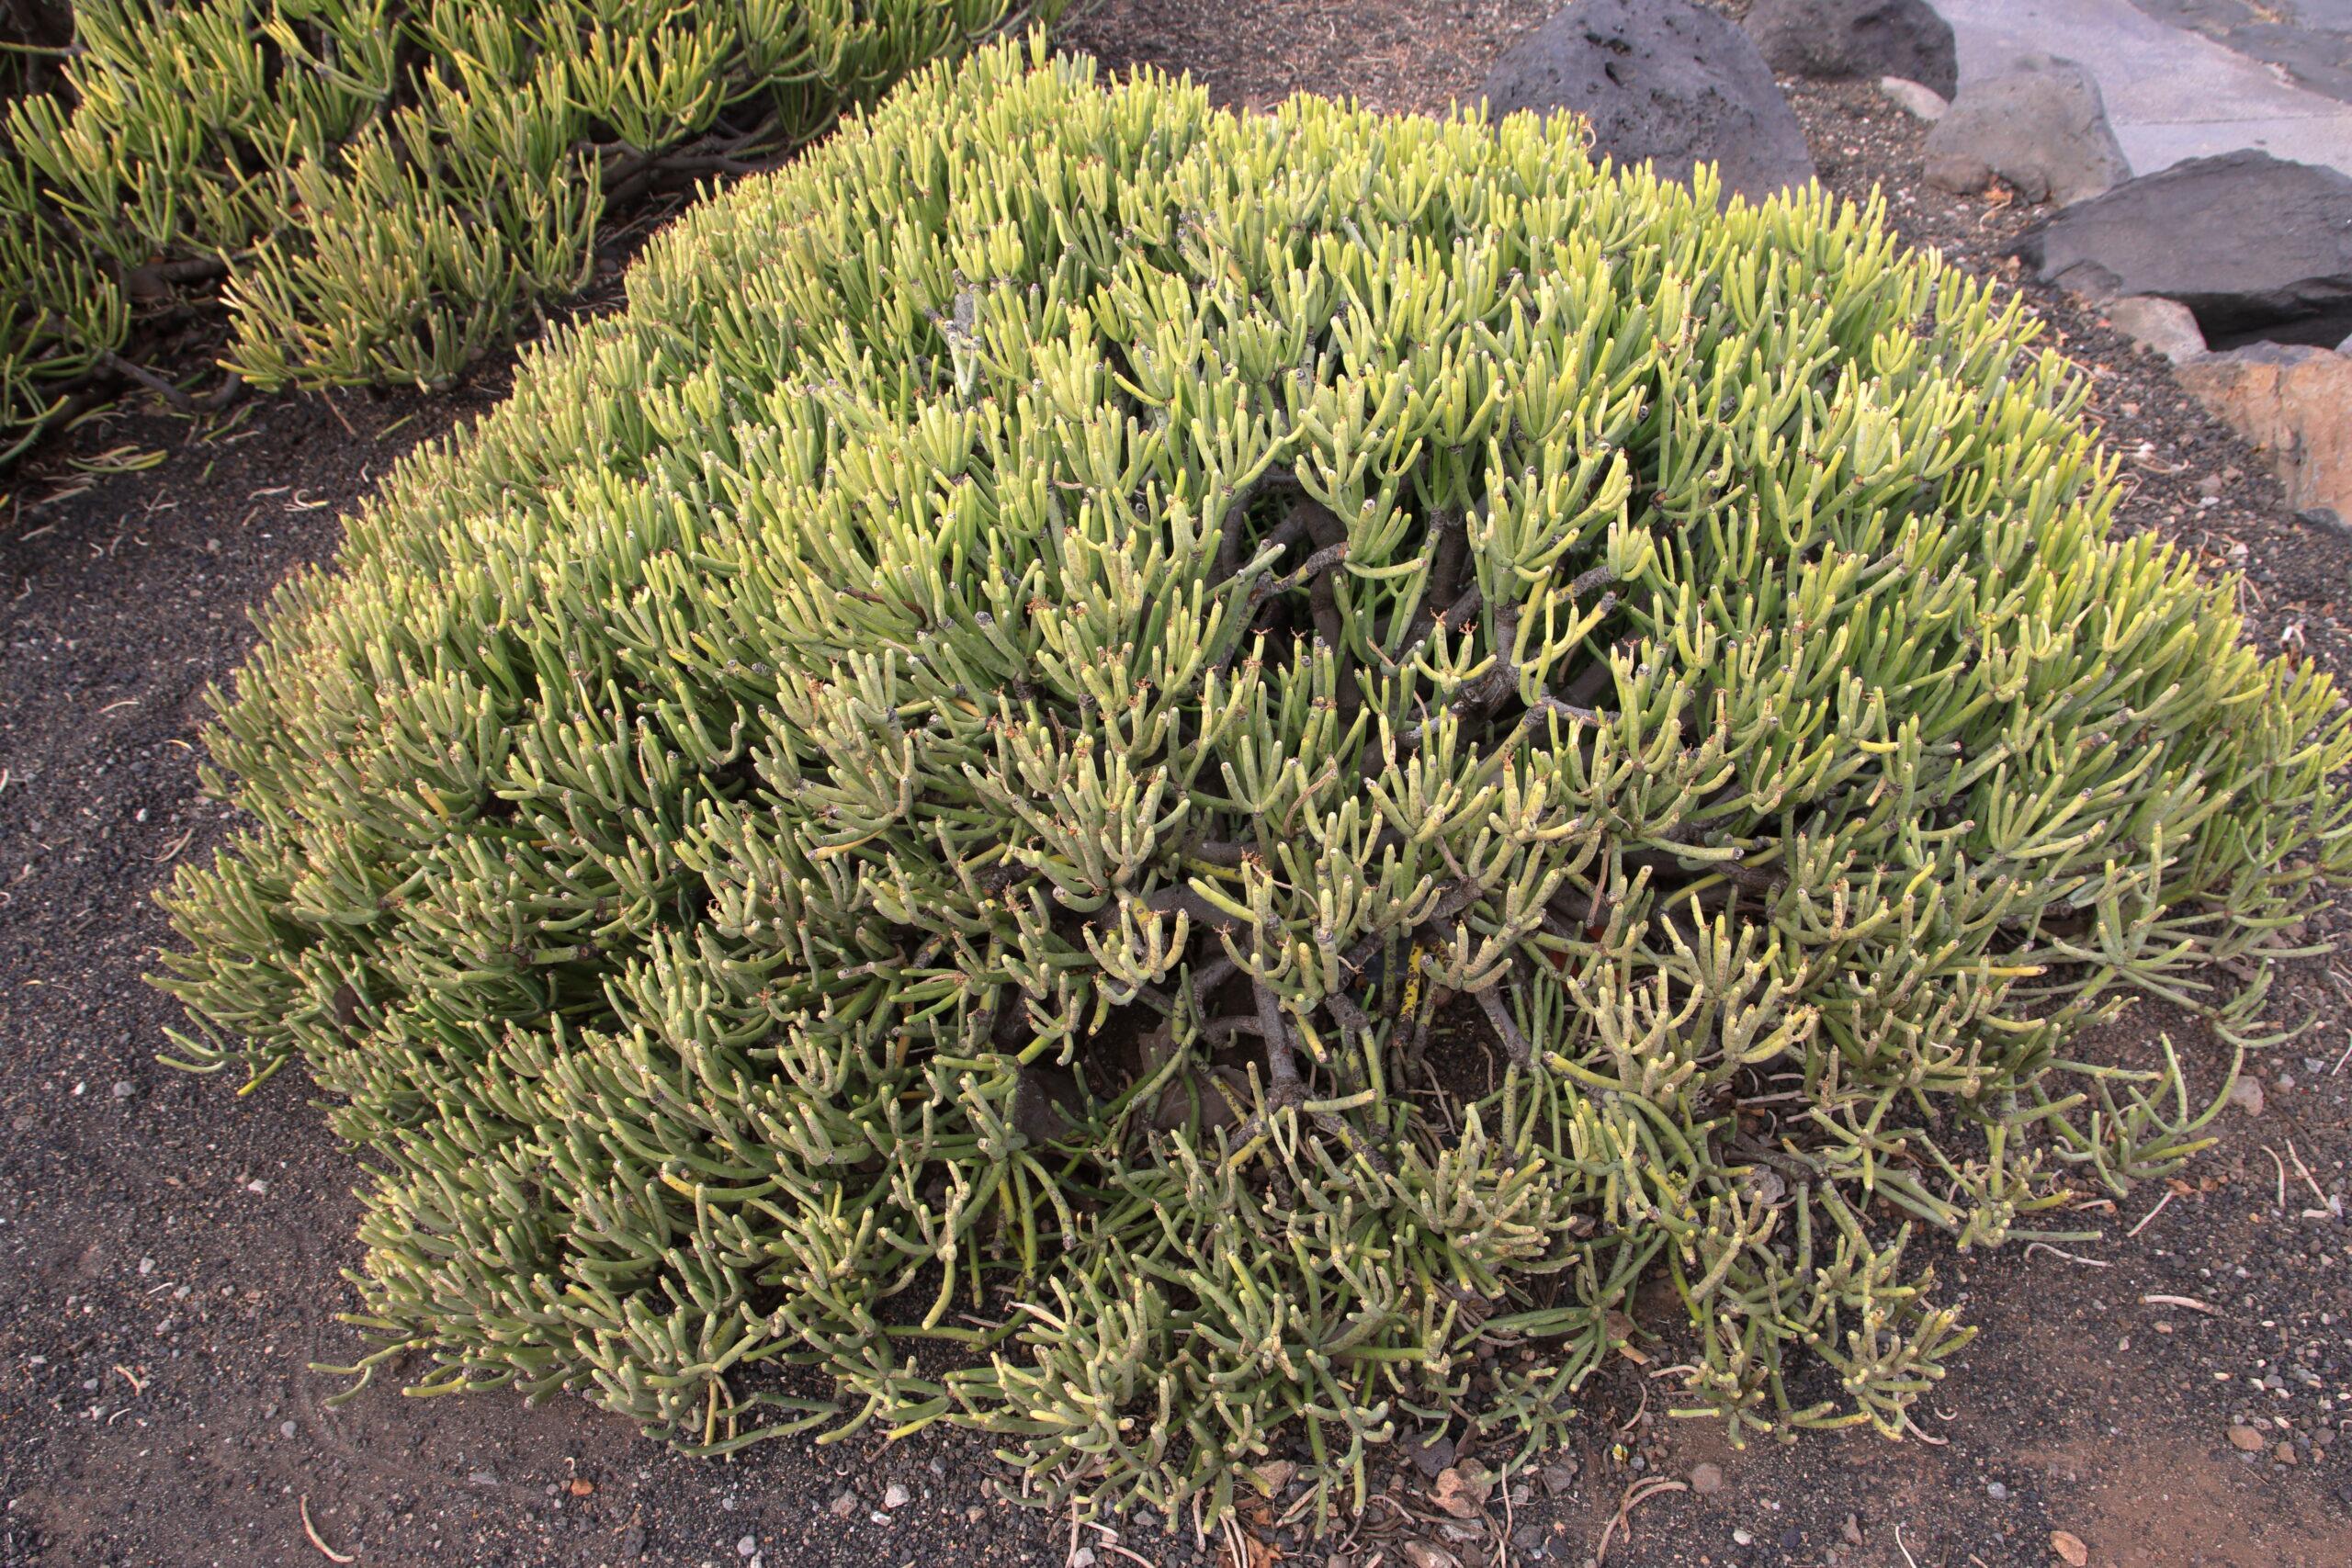 img_7225-general-tolda-tabaiba-salvaje-euphorbia-aphylla-scaled.jpg